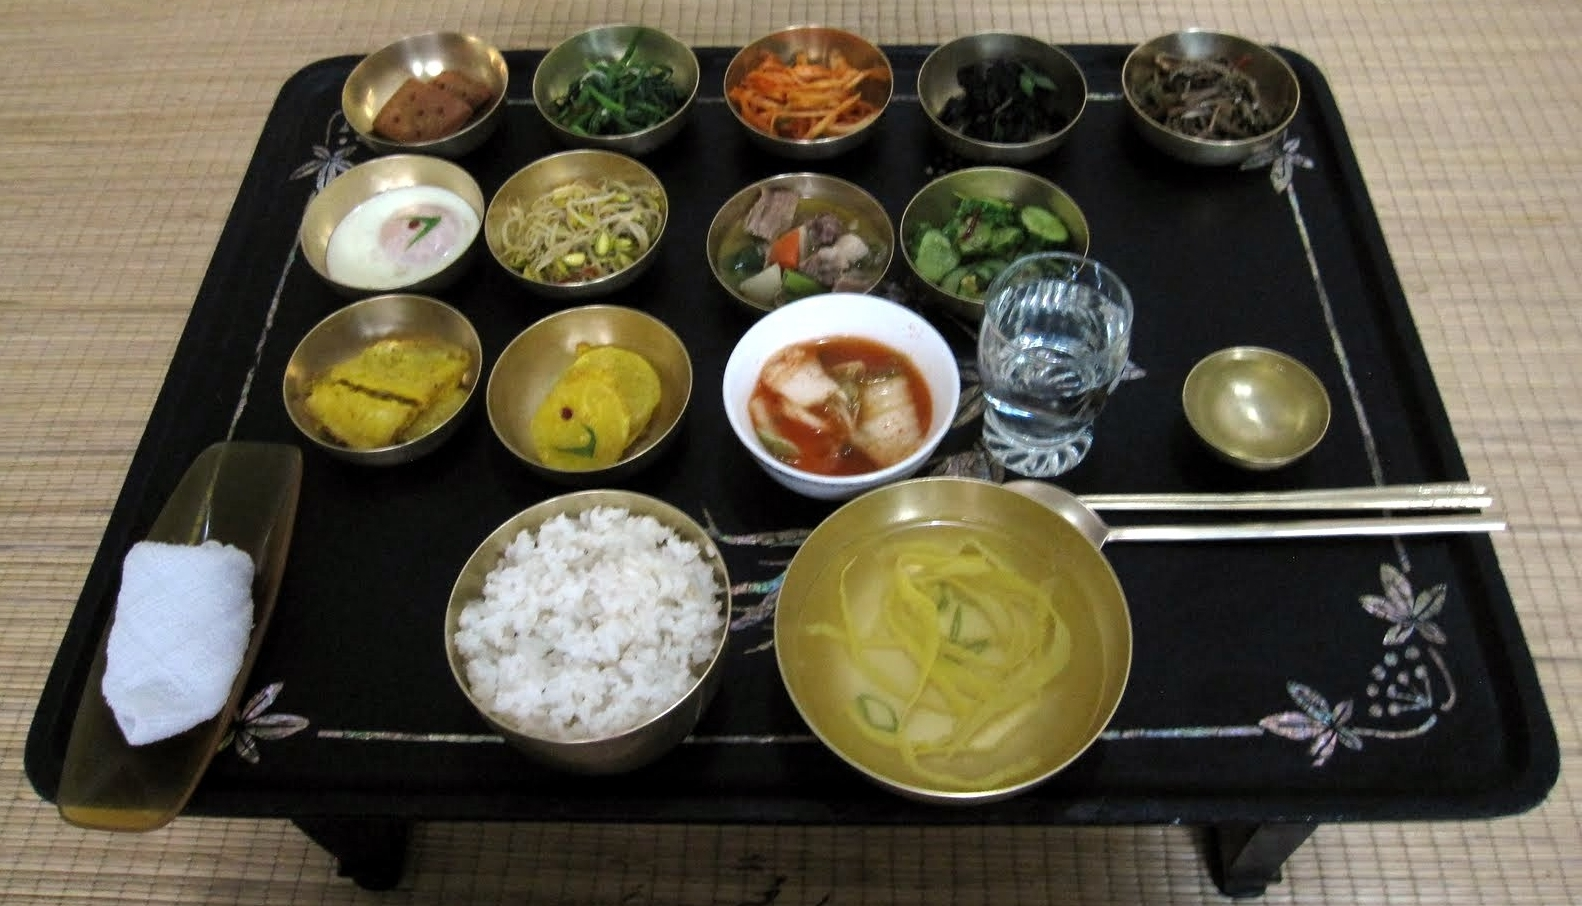 North Korean cuisine - Wikipedia